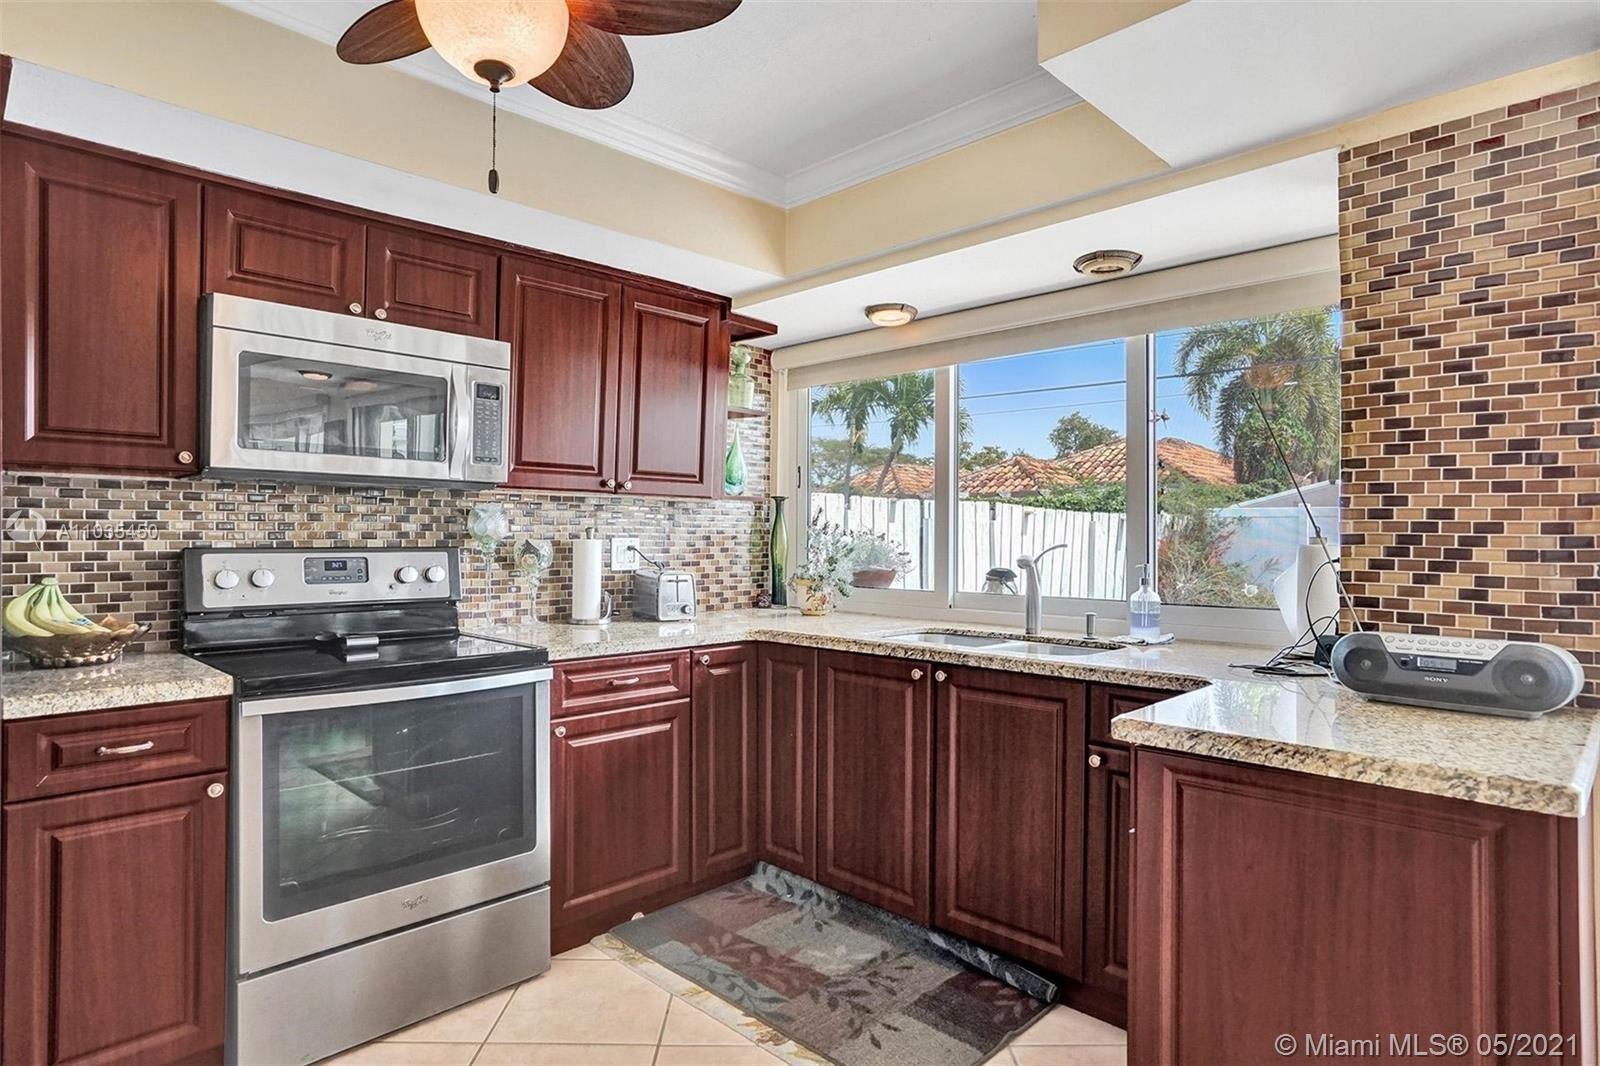 Photo of 2144 NE 64th St, Fort Lauderdale, FL 33308 (MLS # A11035450)